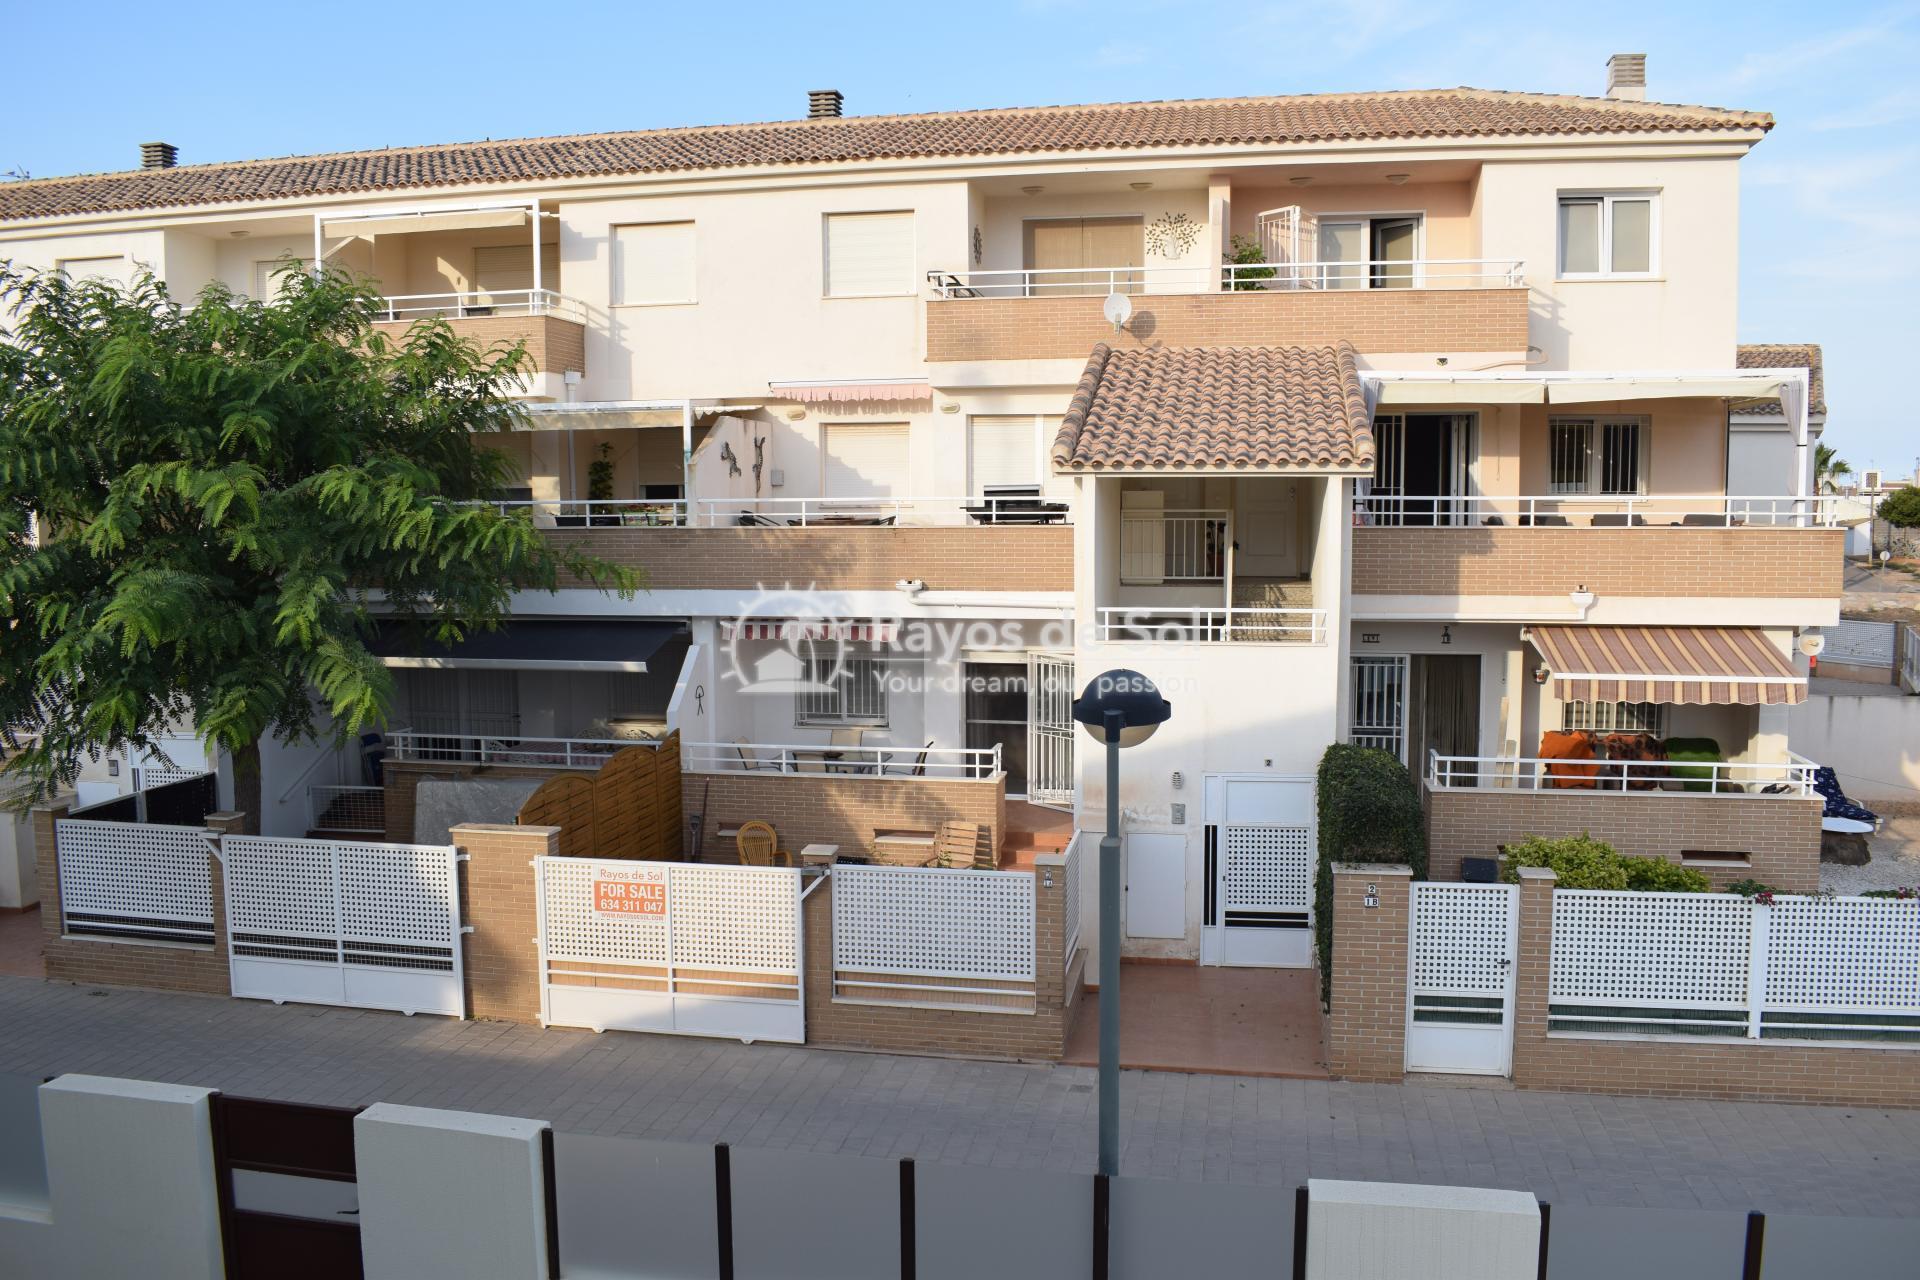 Appartement met zuidwest oriëntatie  in San Cayetano, Costa Cálida (SCRE0055) - 1